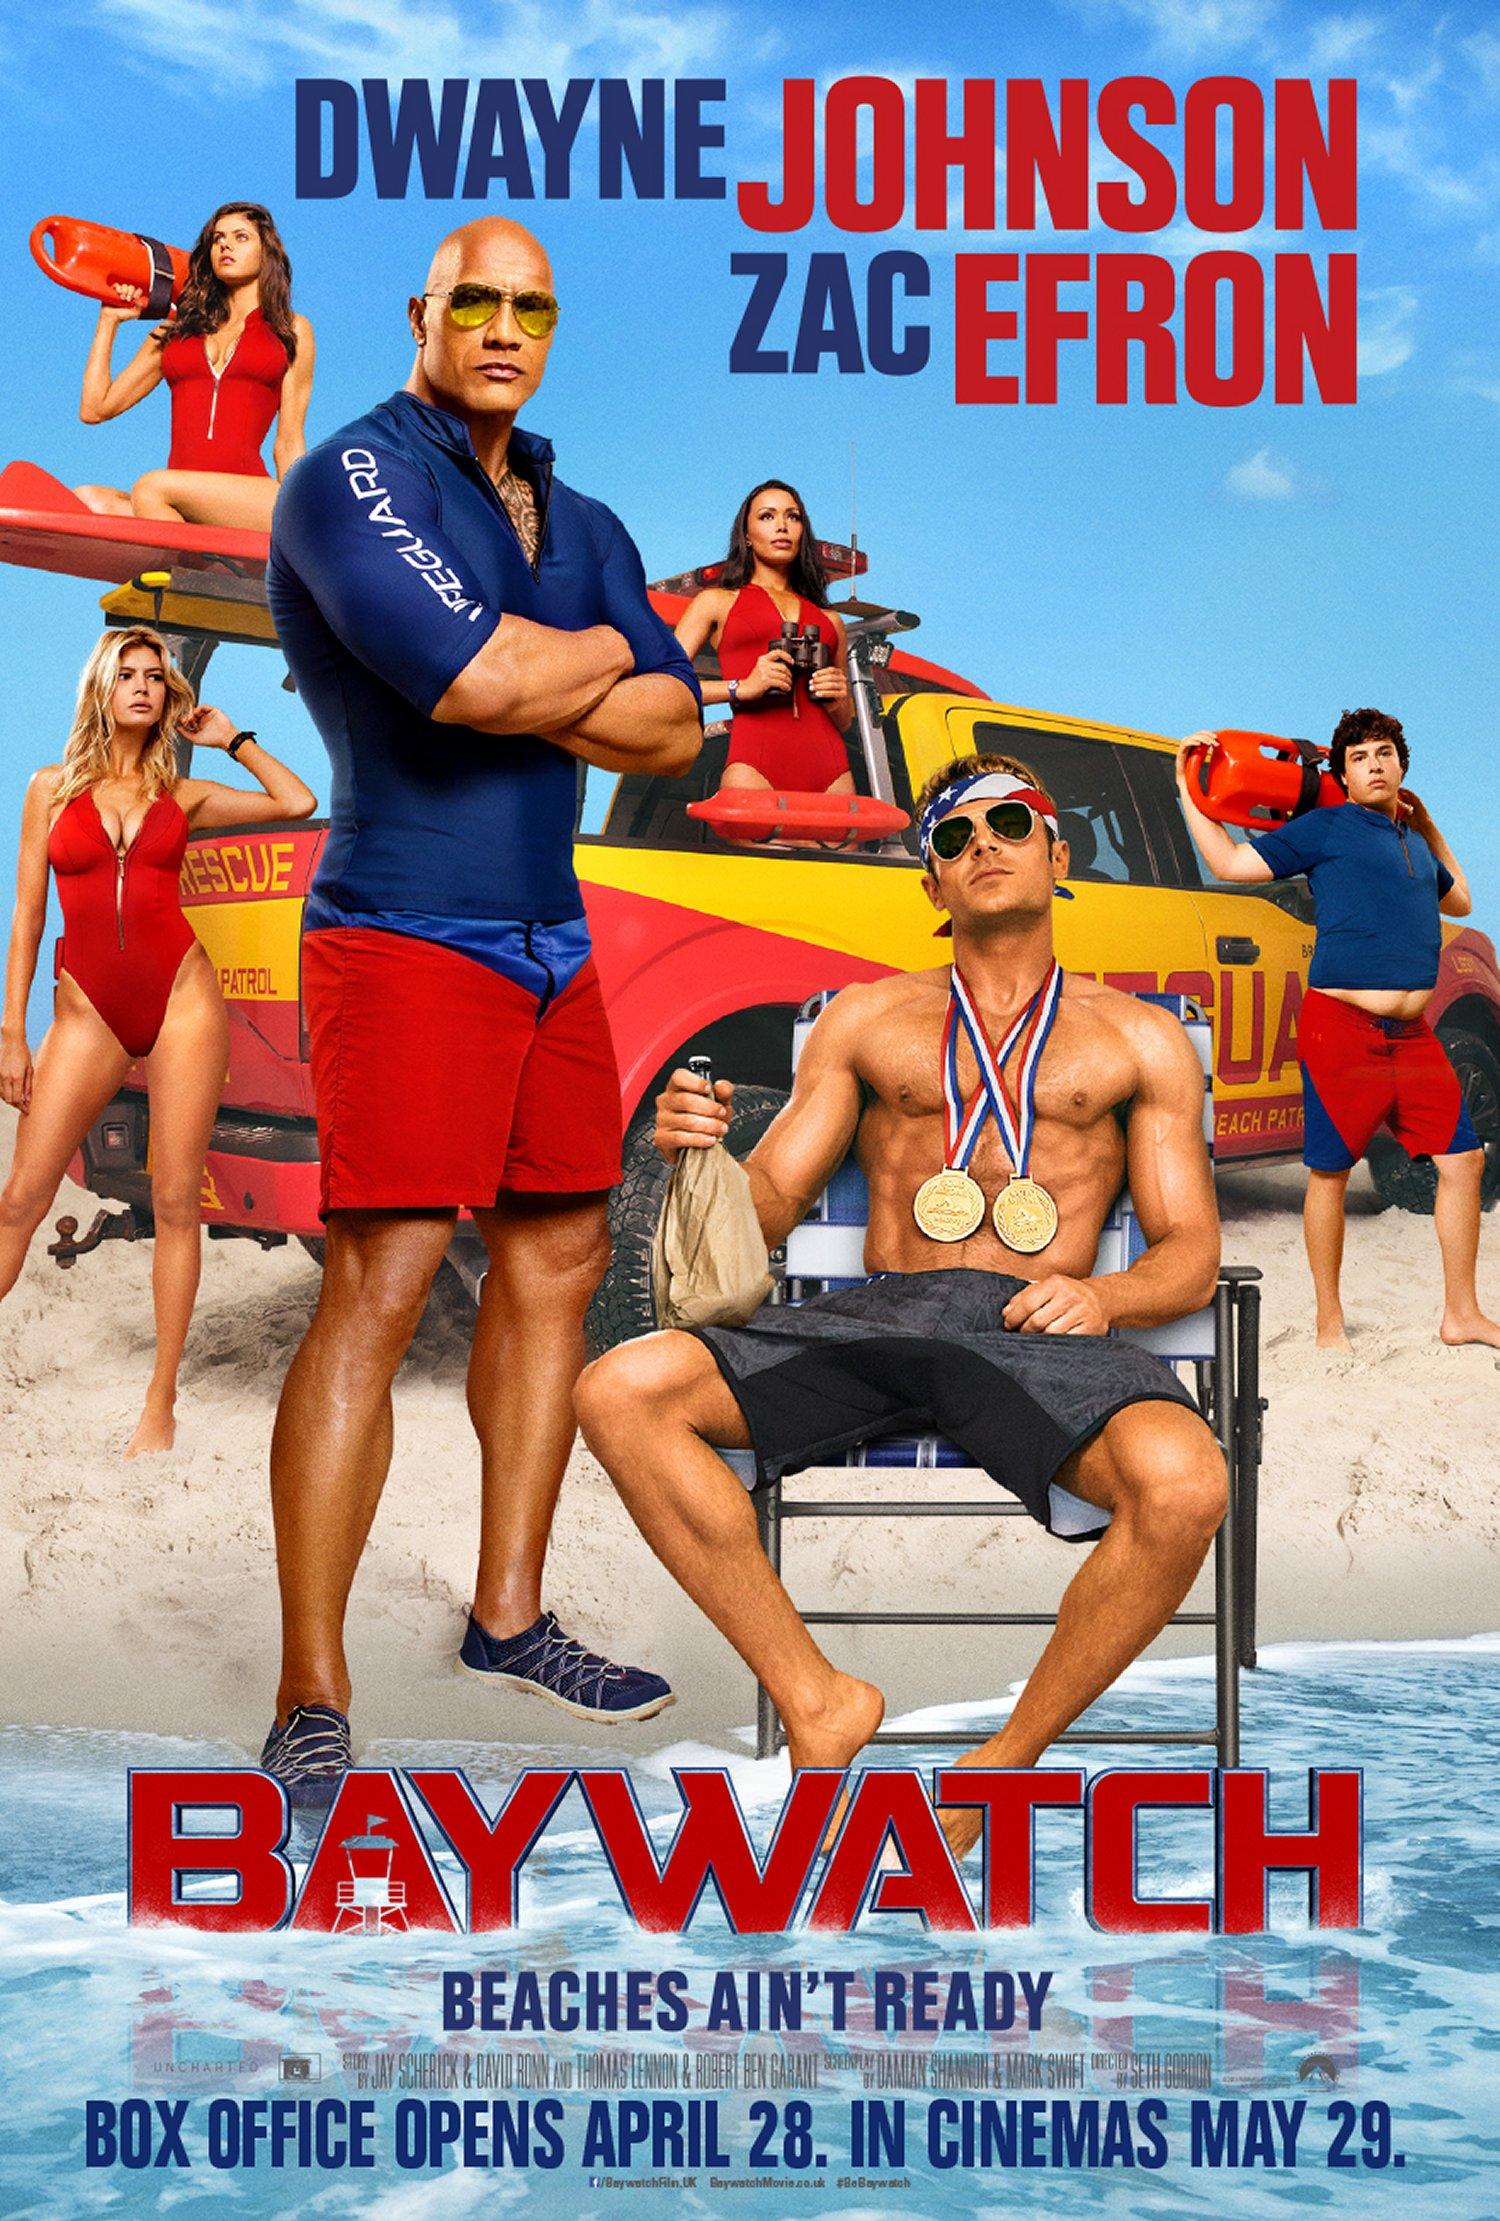 Baywatch truck poster